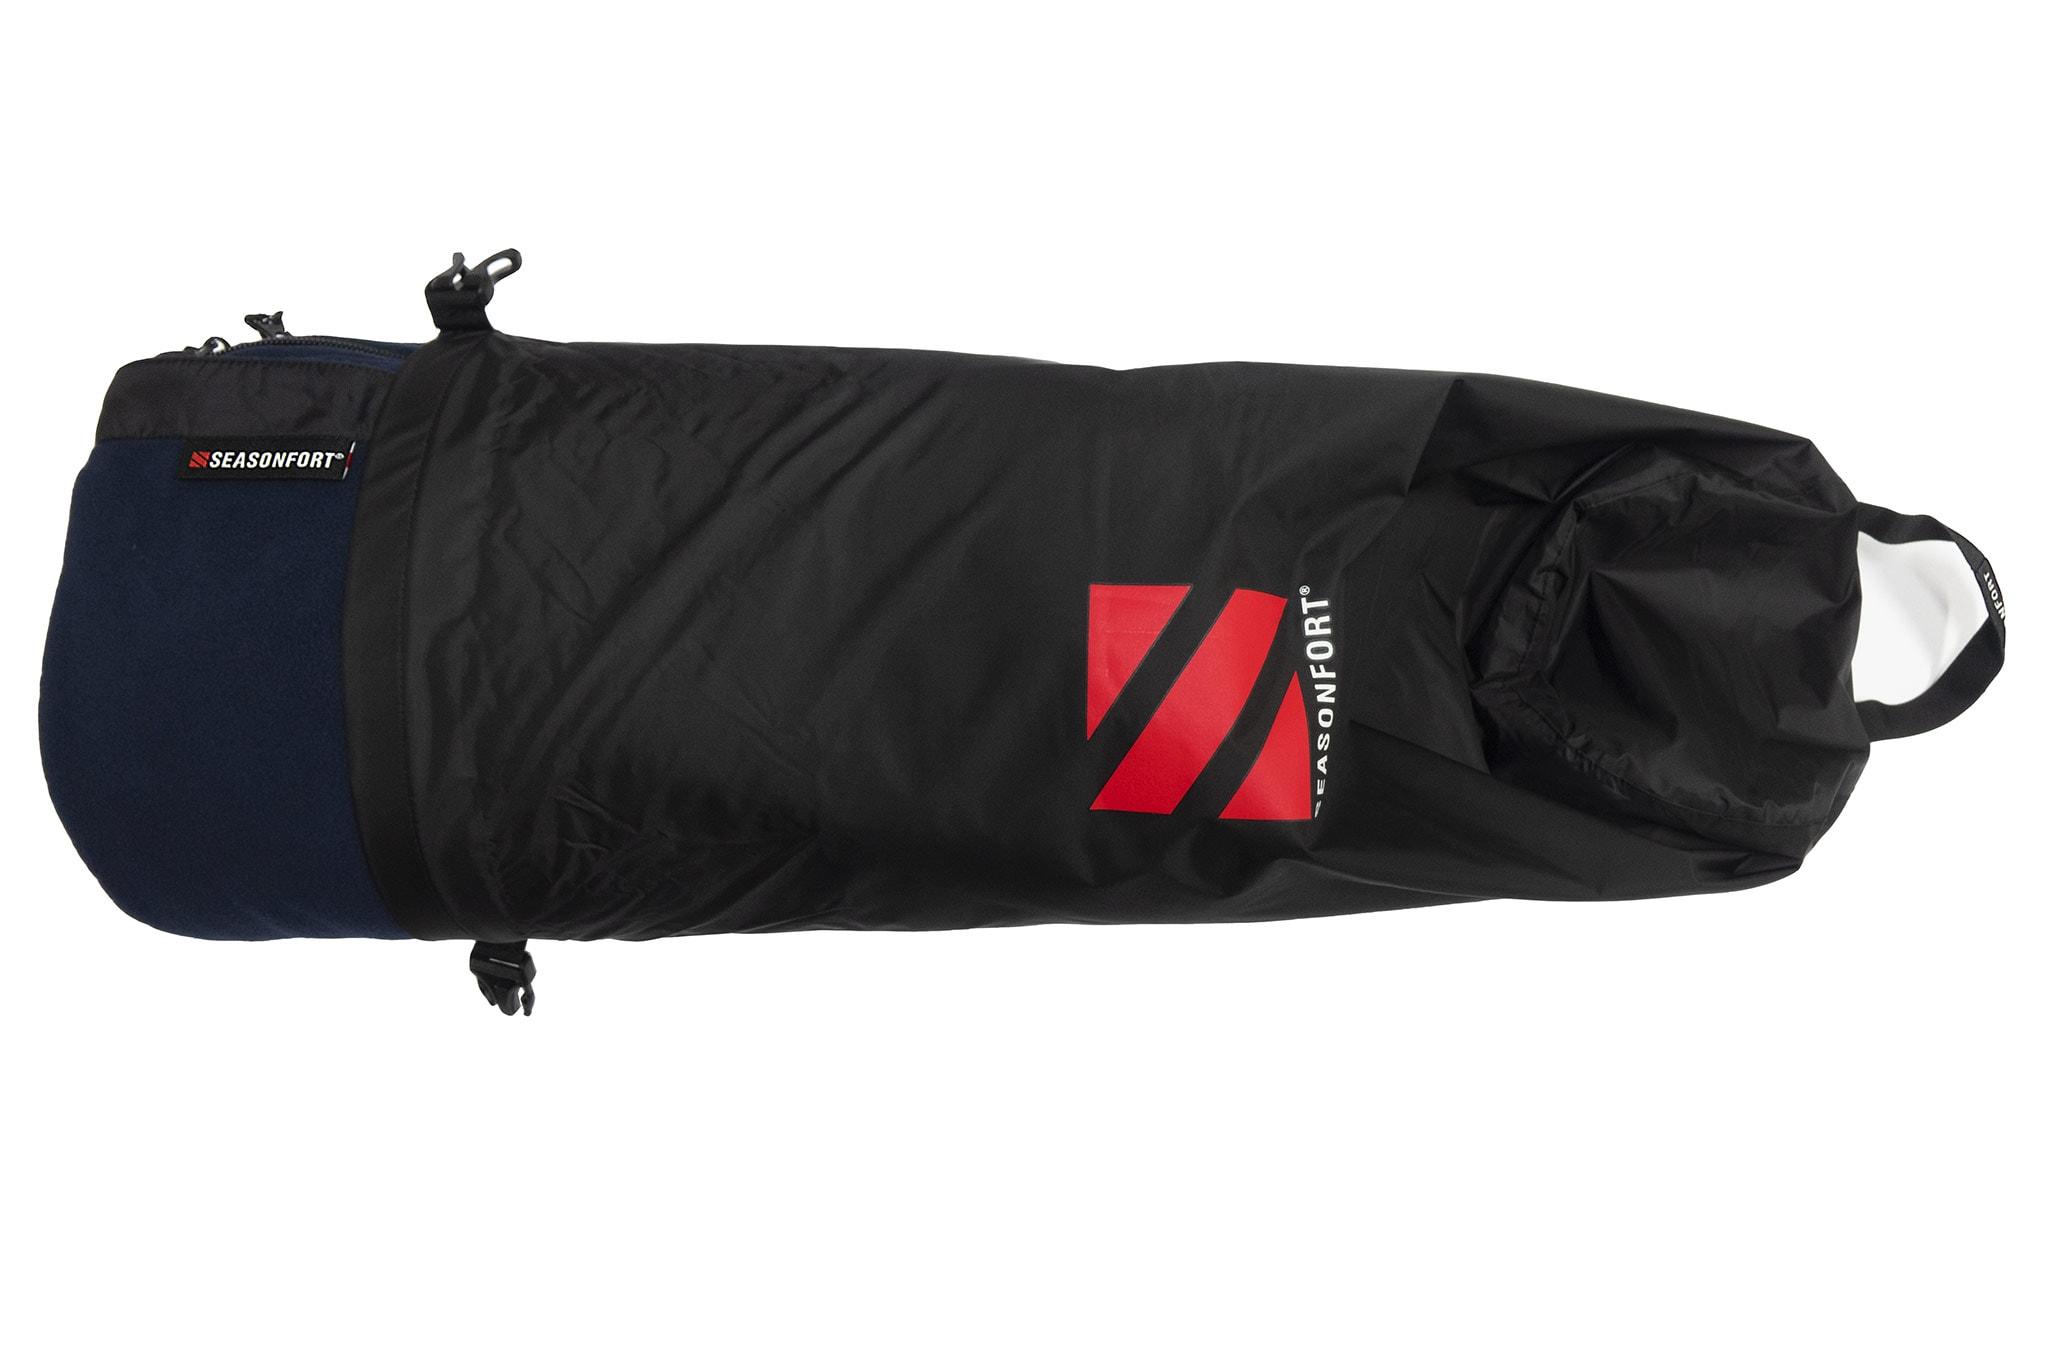 SEASONFORT Fire Retardant Sleeping Bag and Dry Bag